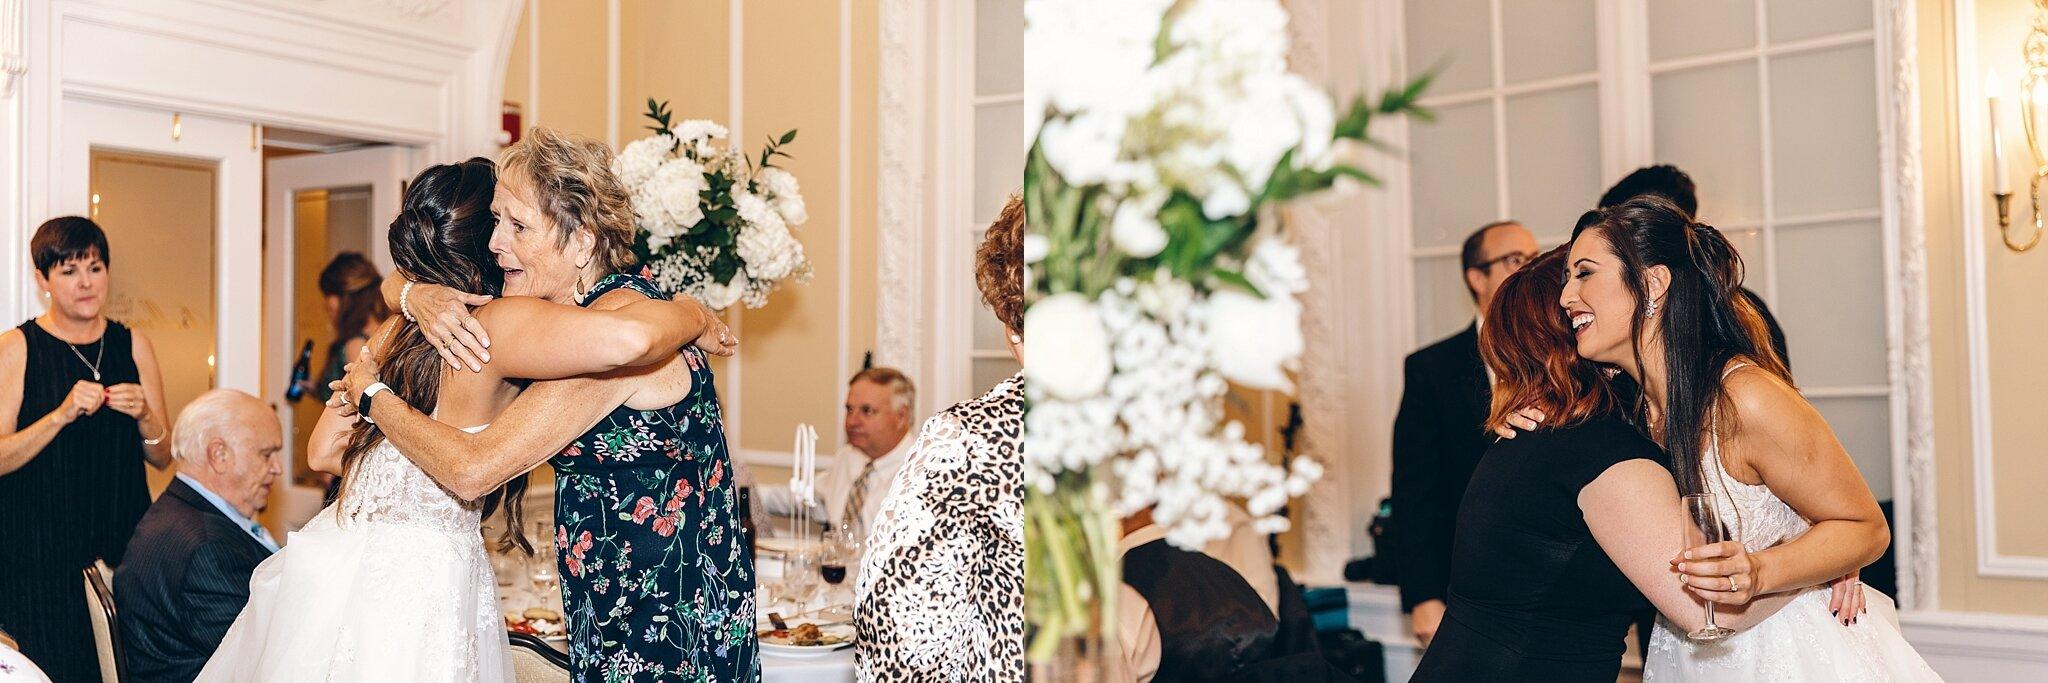 patrick-henry-ballroom-wedding-roanoke_0538.jpg